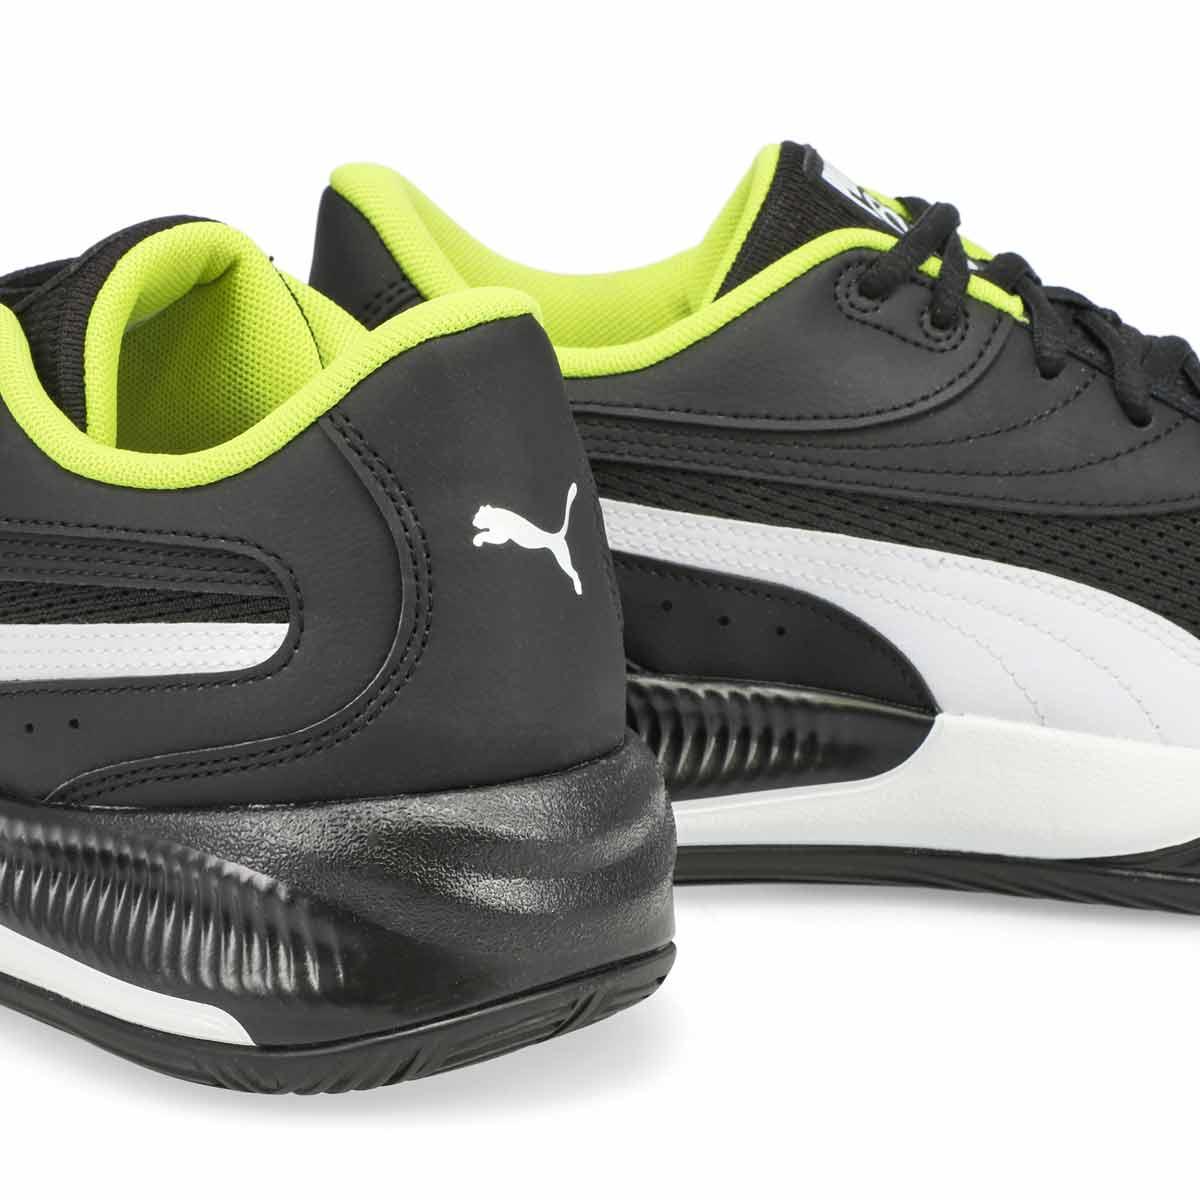 Men's Triple Lace Up Sneaker- Black/White